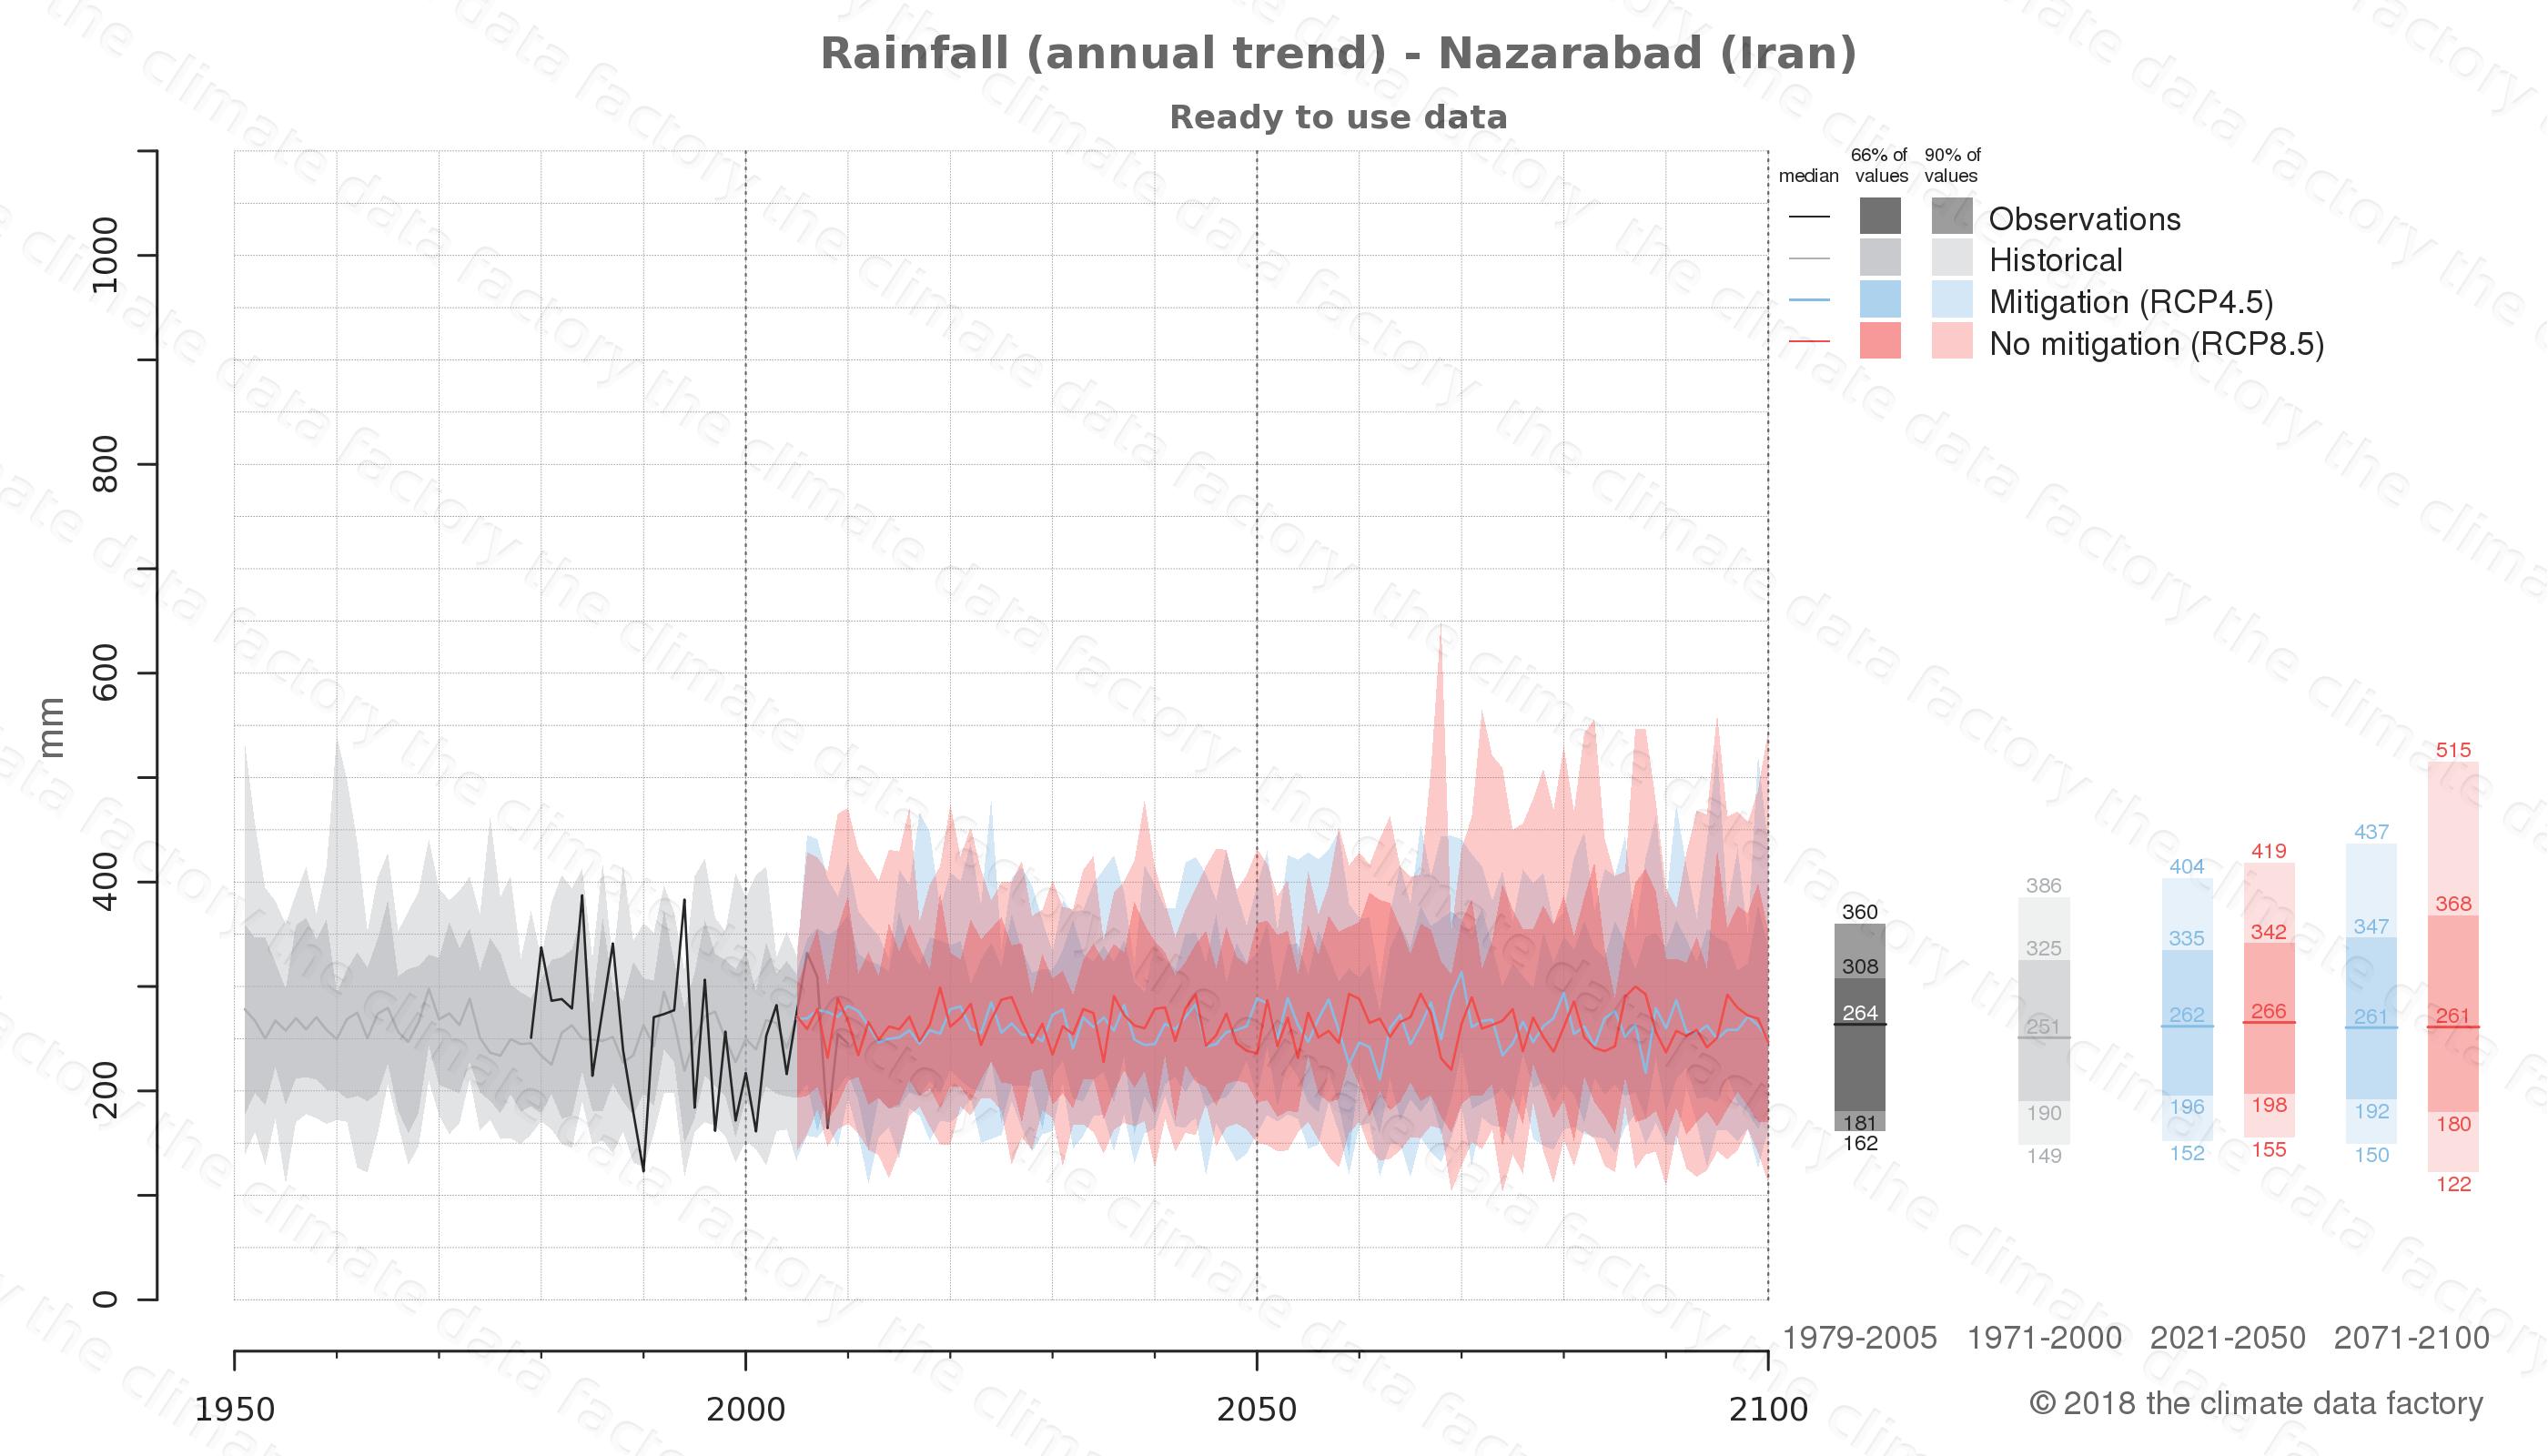 climate change data policy adaptation climate graph city data rainfall nazarabad iran